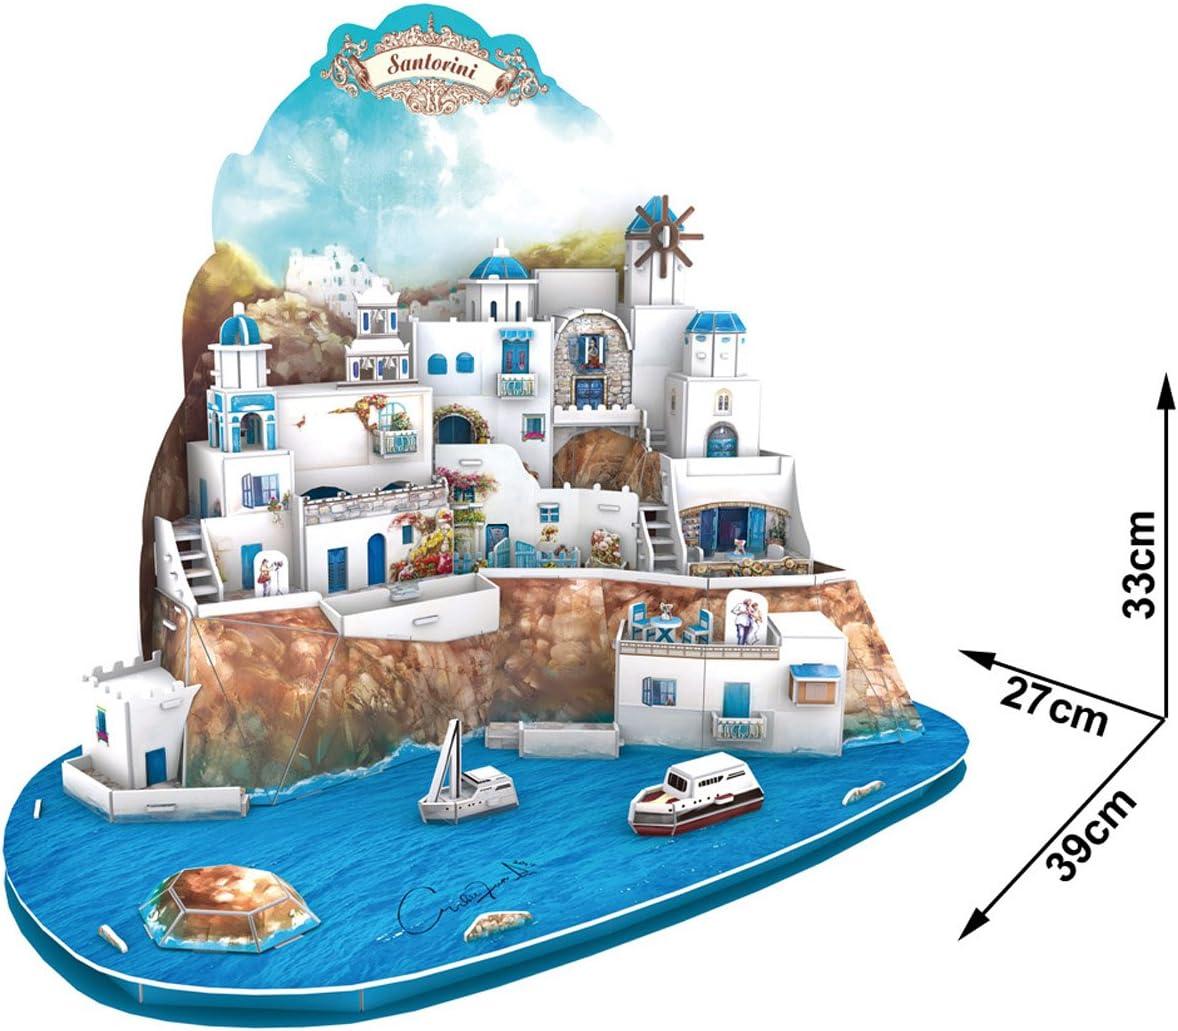 3D Puzzle Islas San Torini Grecia Santorini Islands Griechenland ...